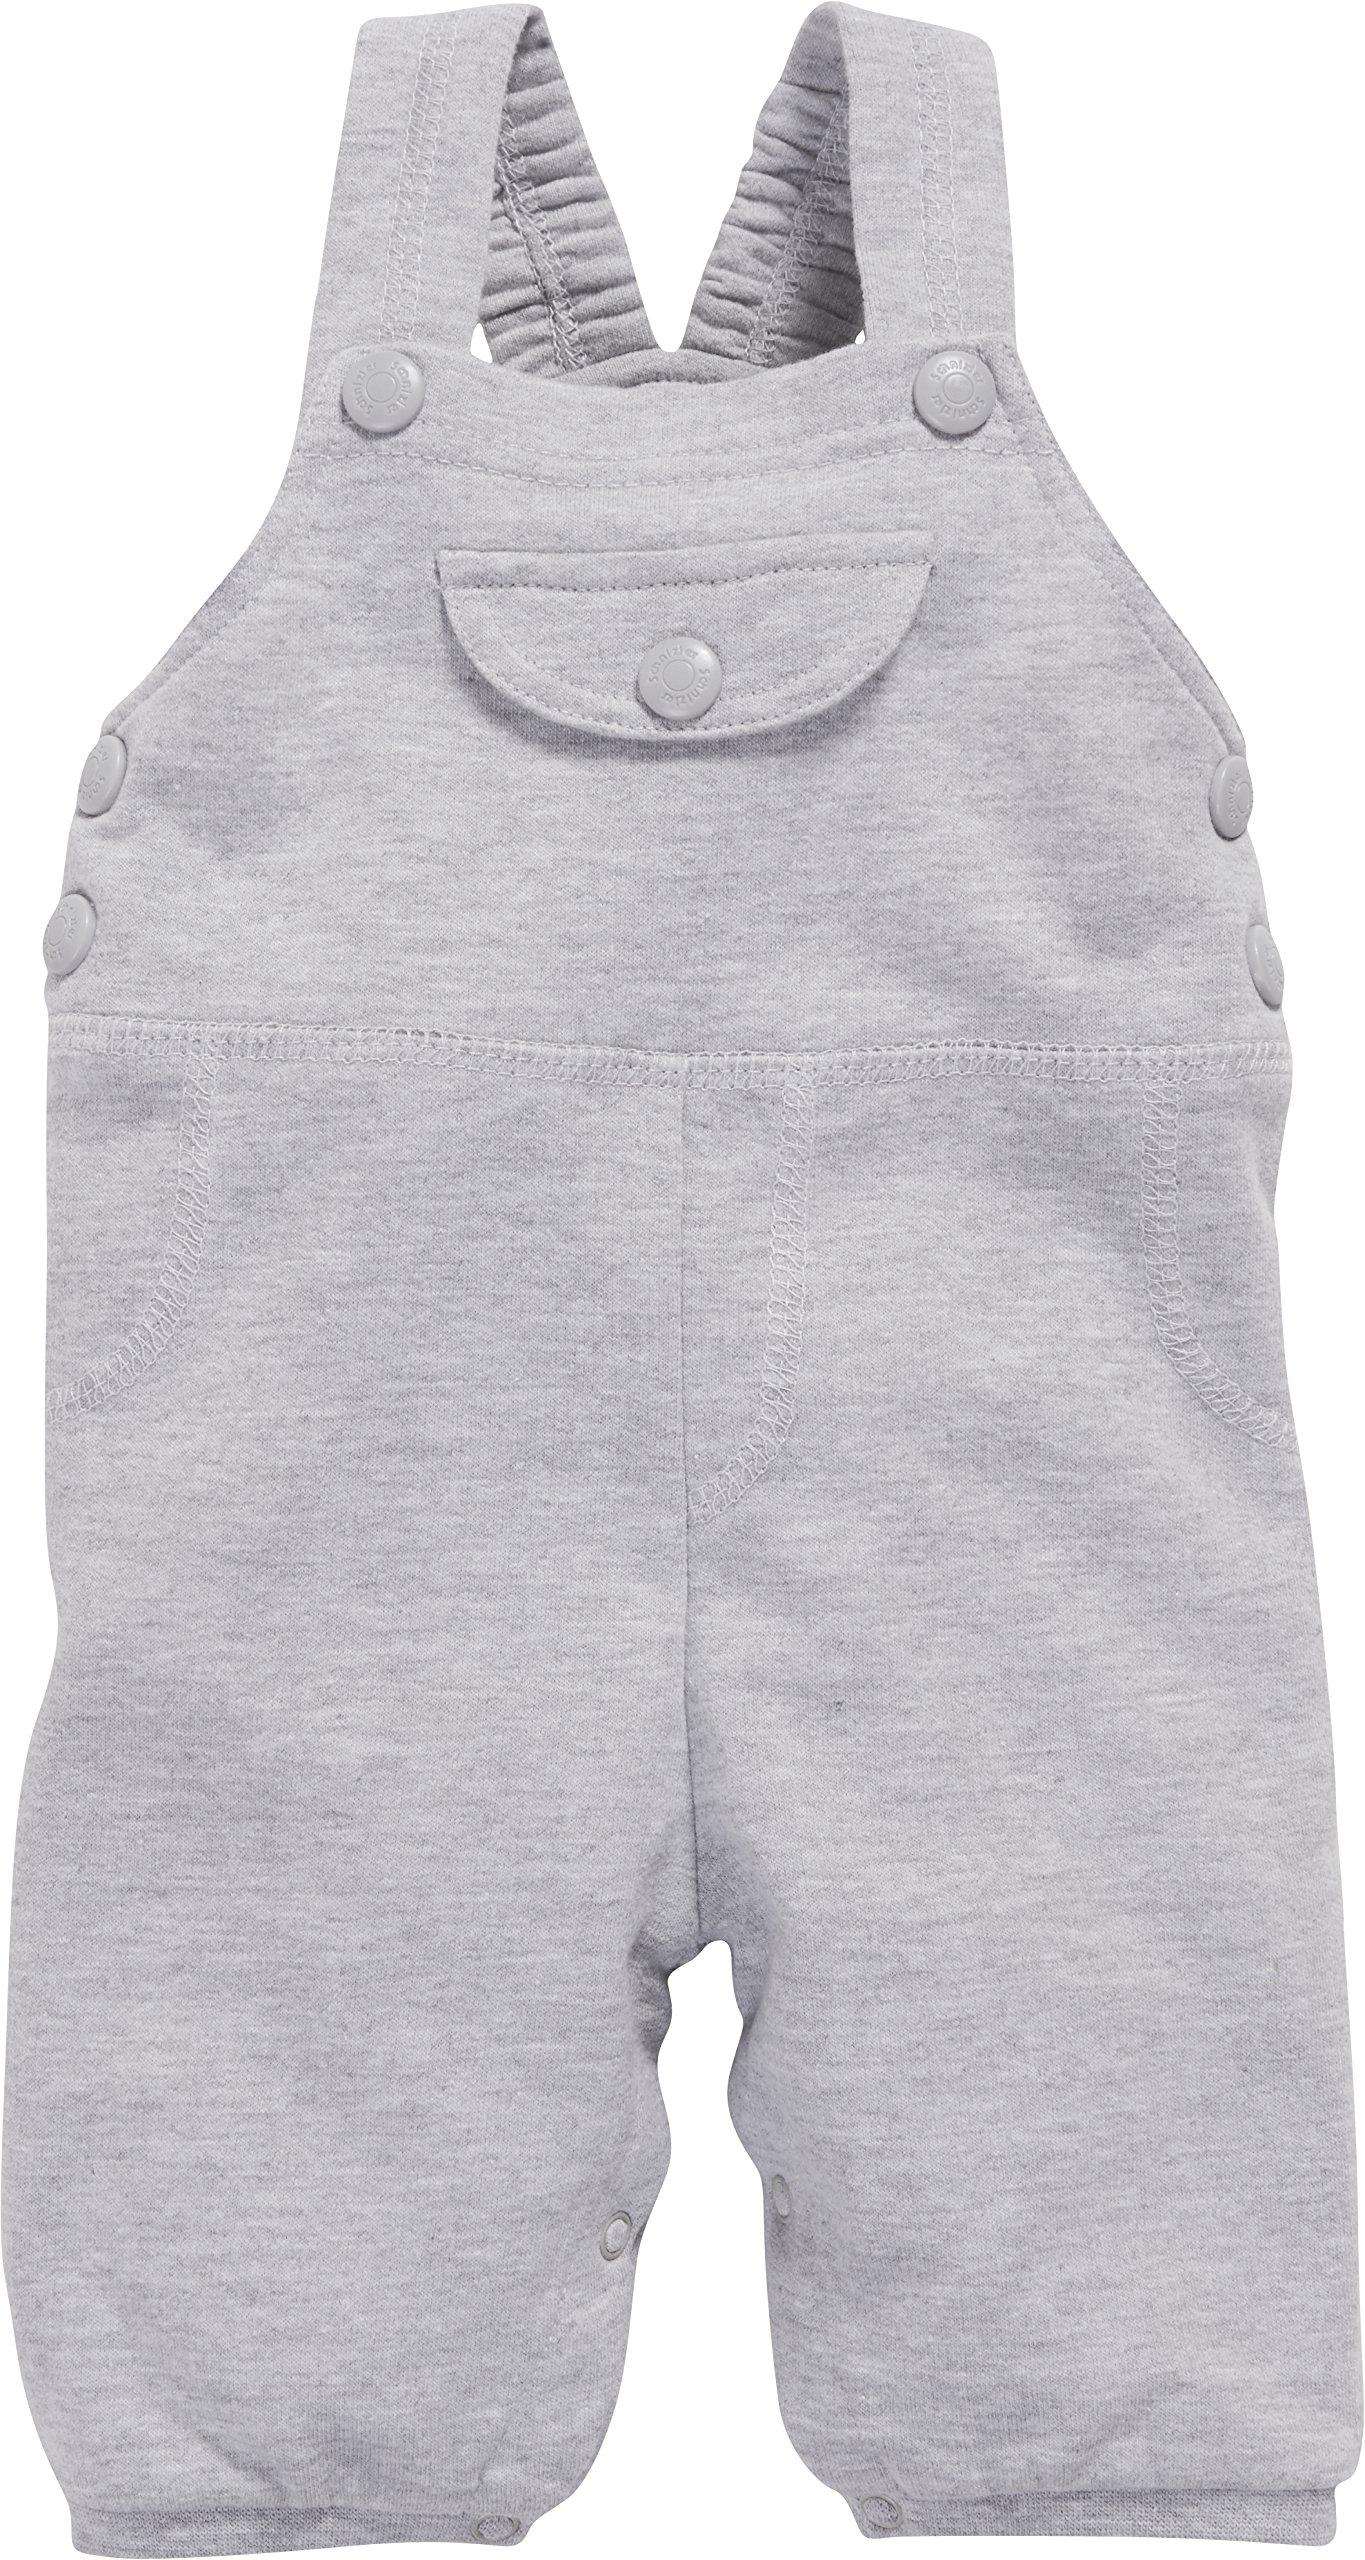 Schnizler Baby Sweat-Latzhose Meliert Pantalones de Peto para Bebés 1